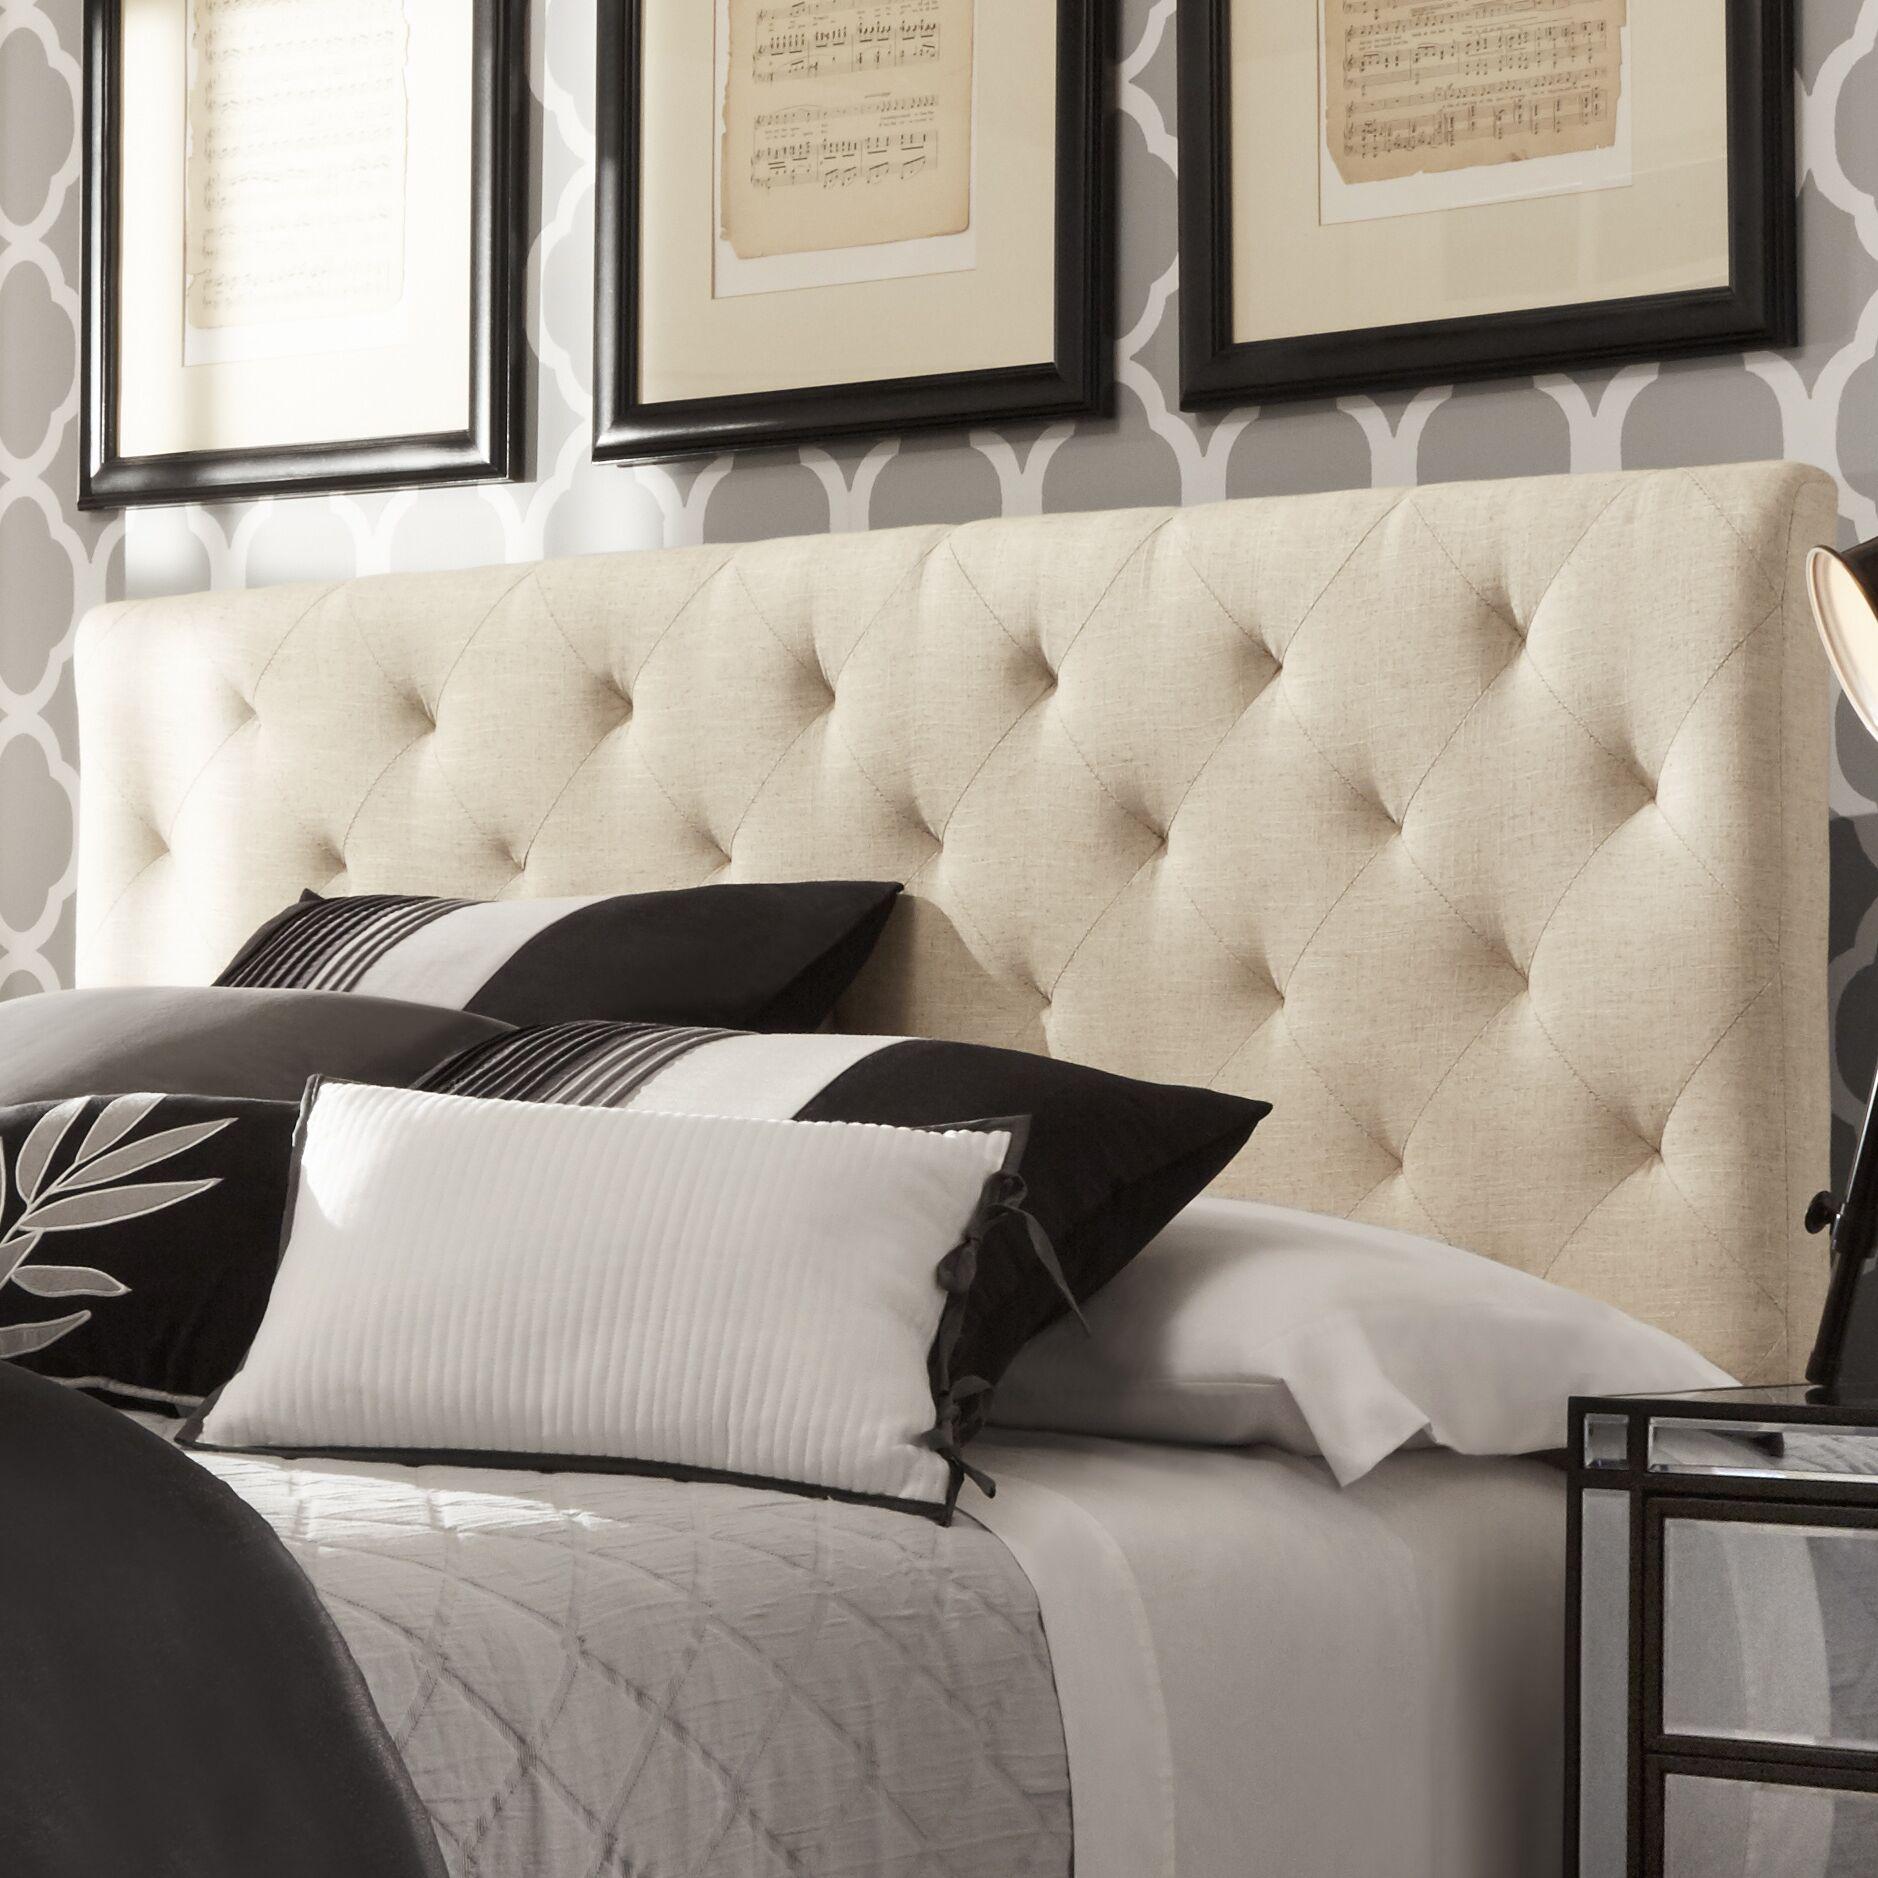 Tripoli Upholstered Panel Headboard Upholstery: Dark Gray, Size: King